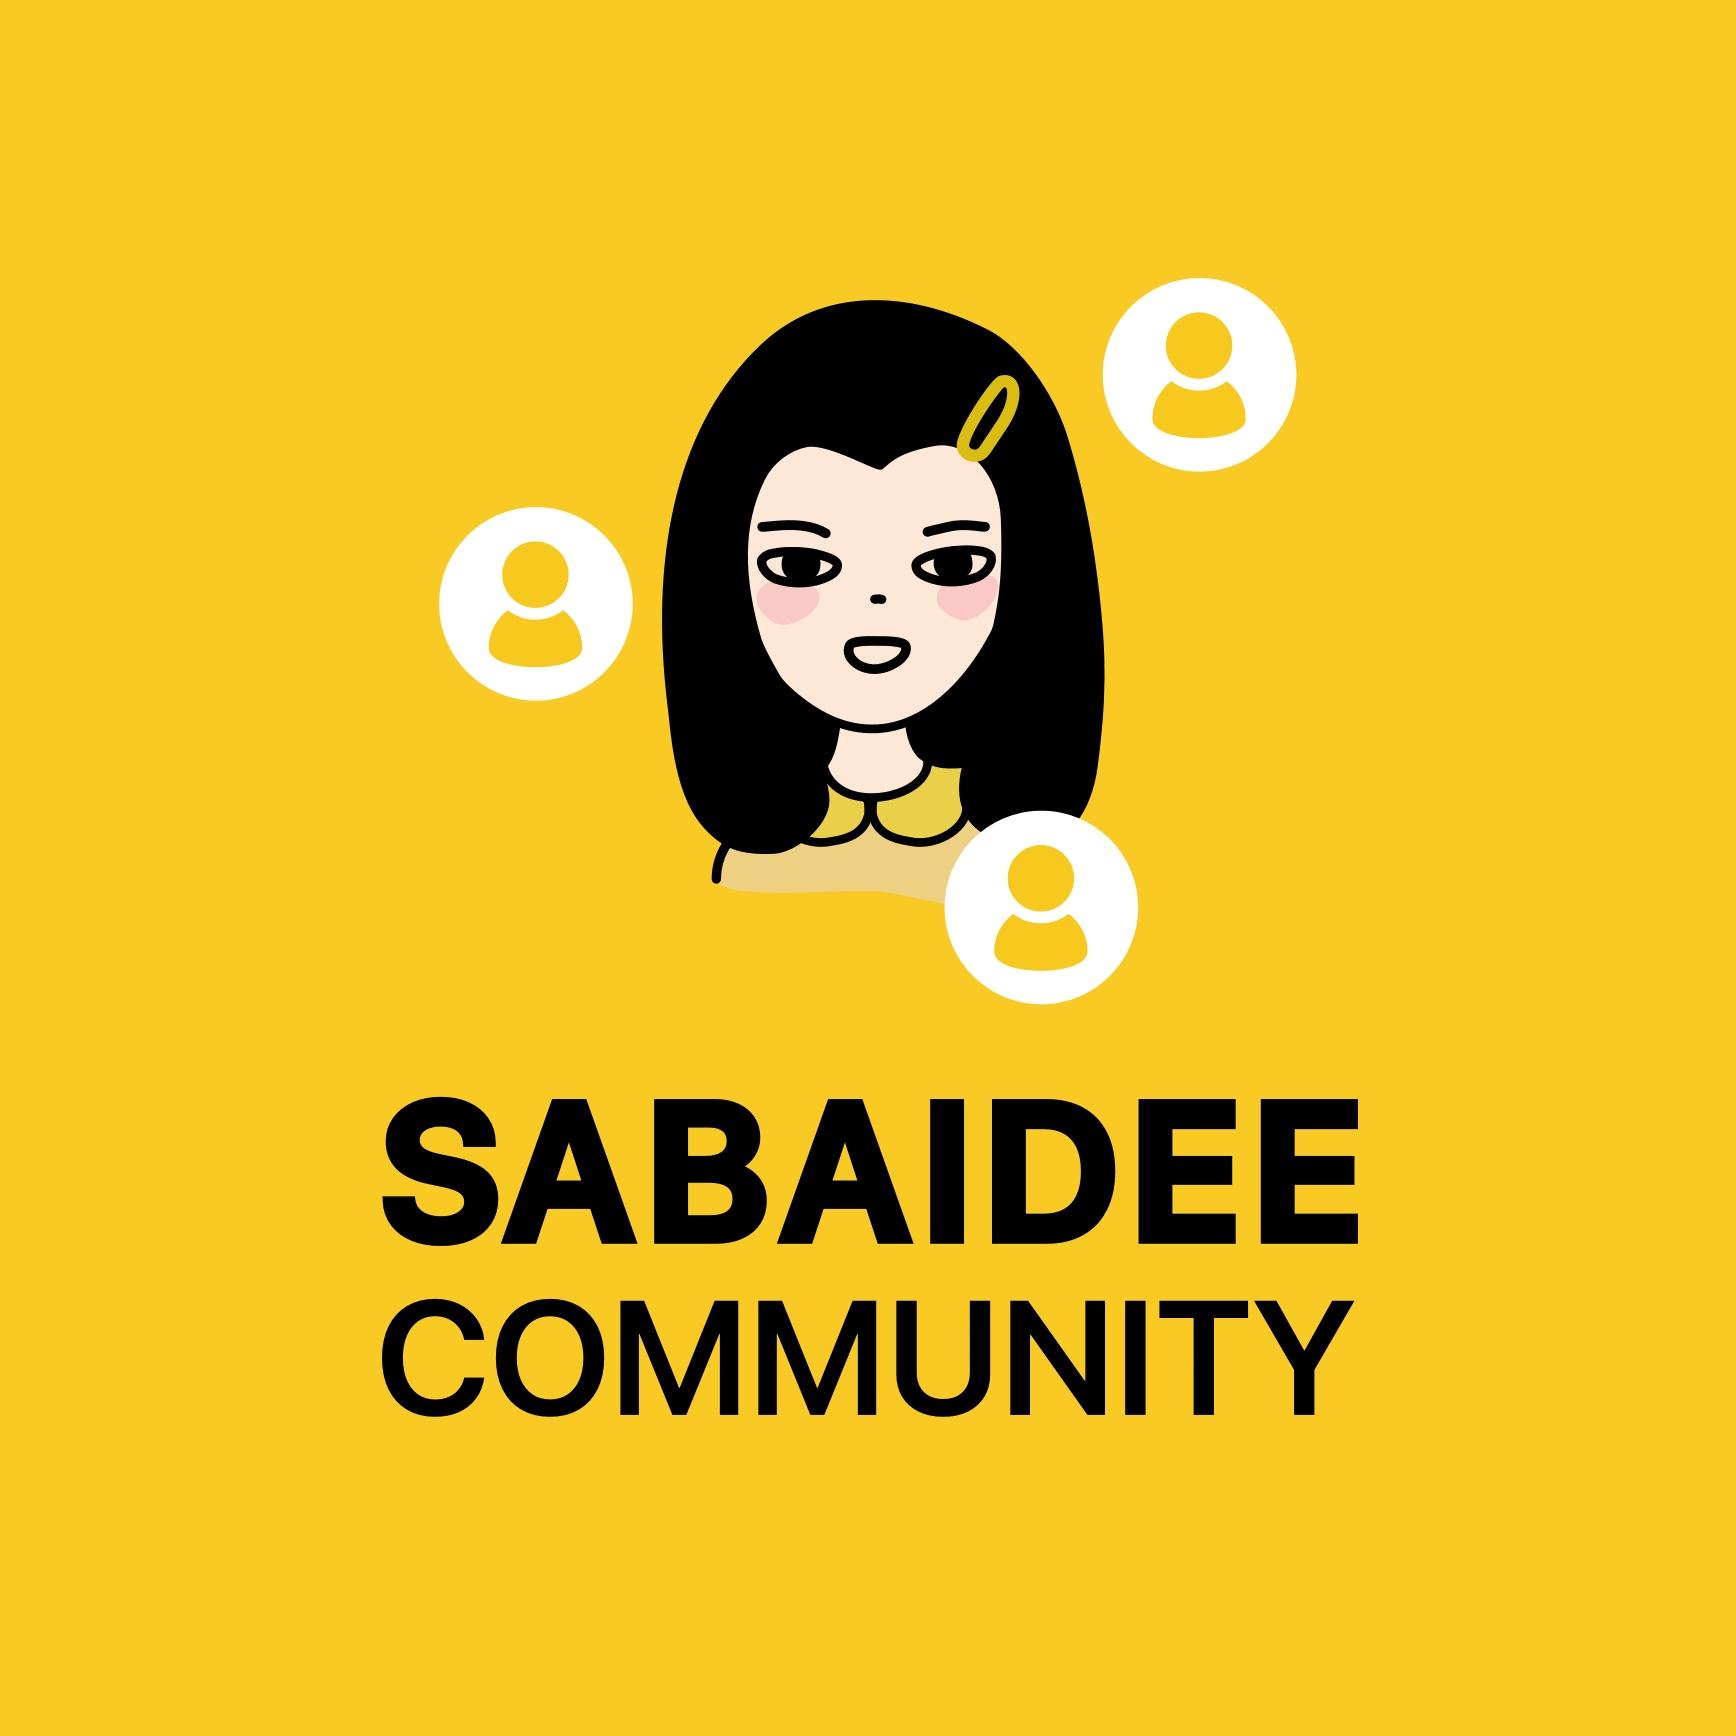 Sabaidee Community